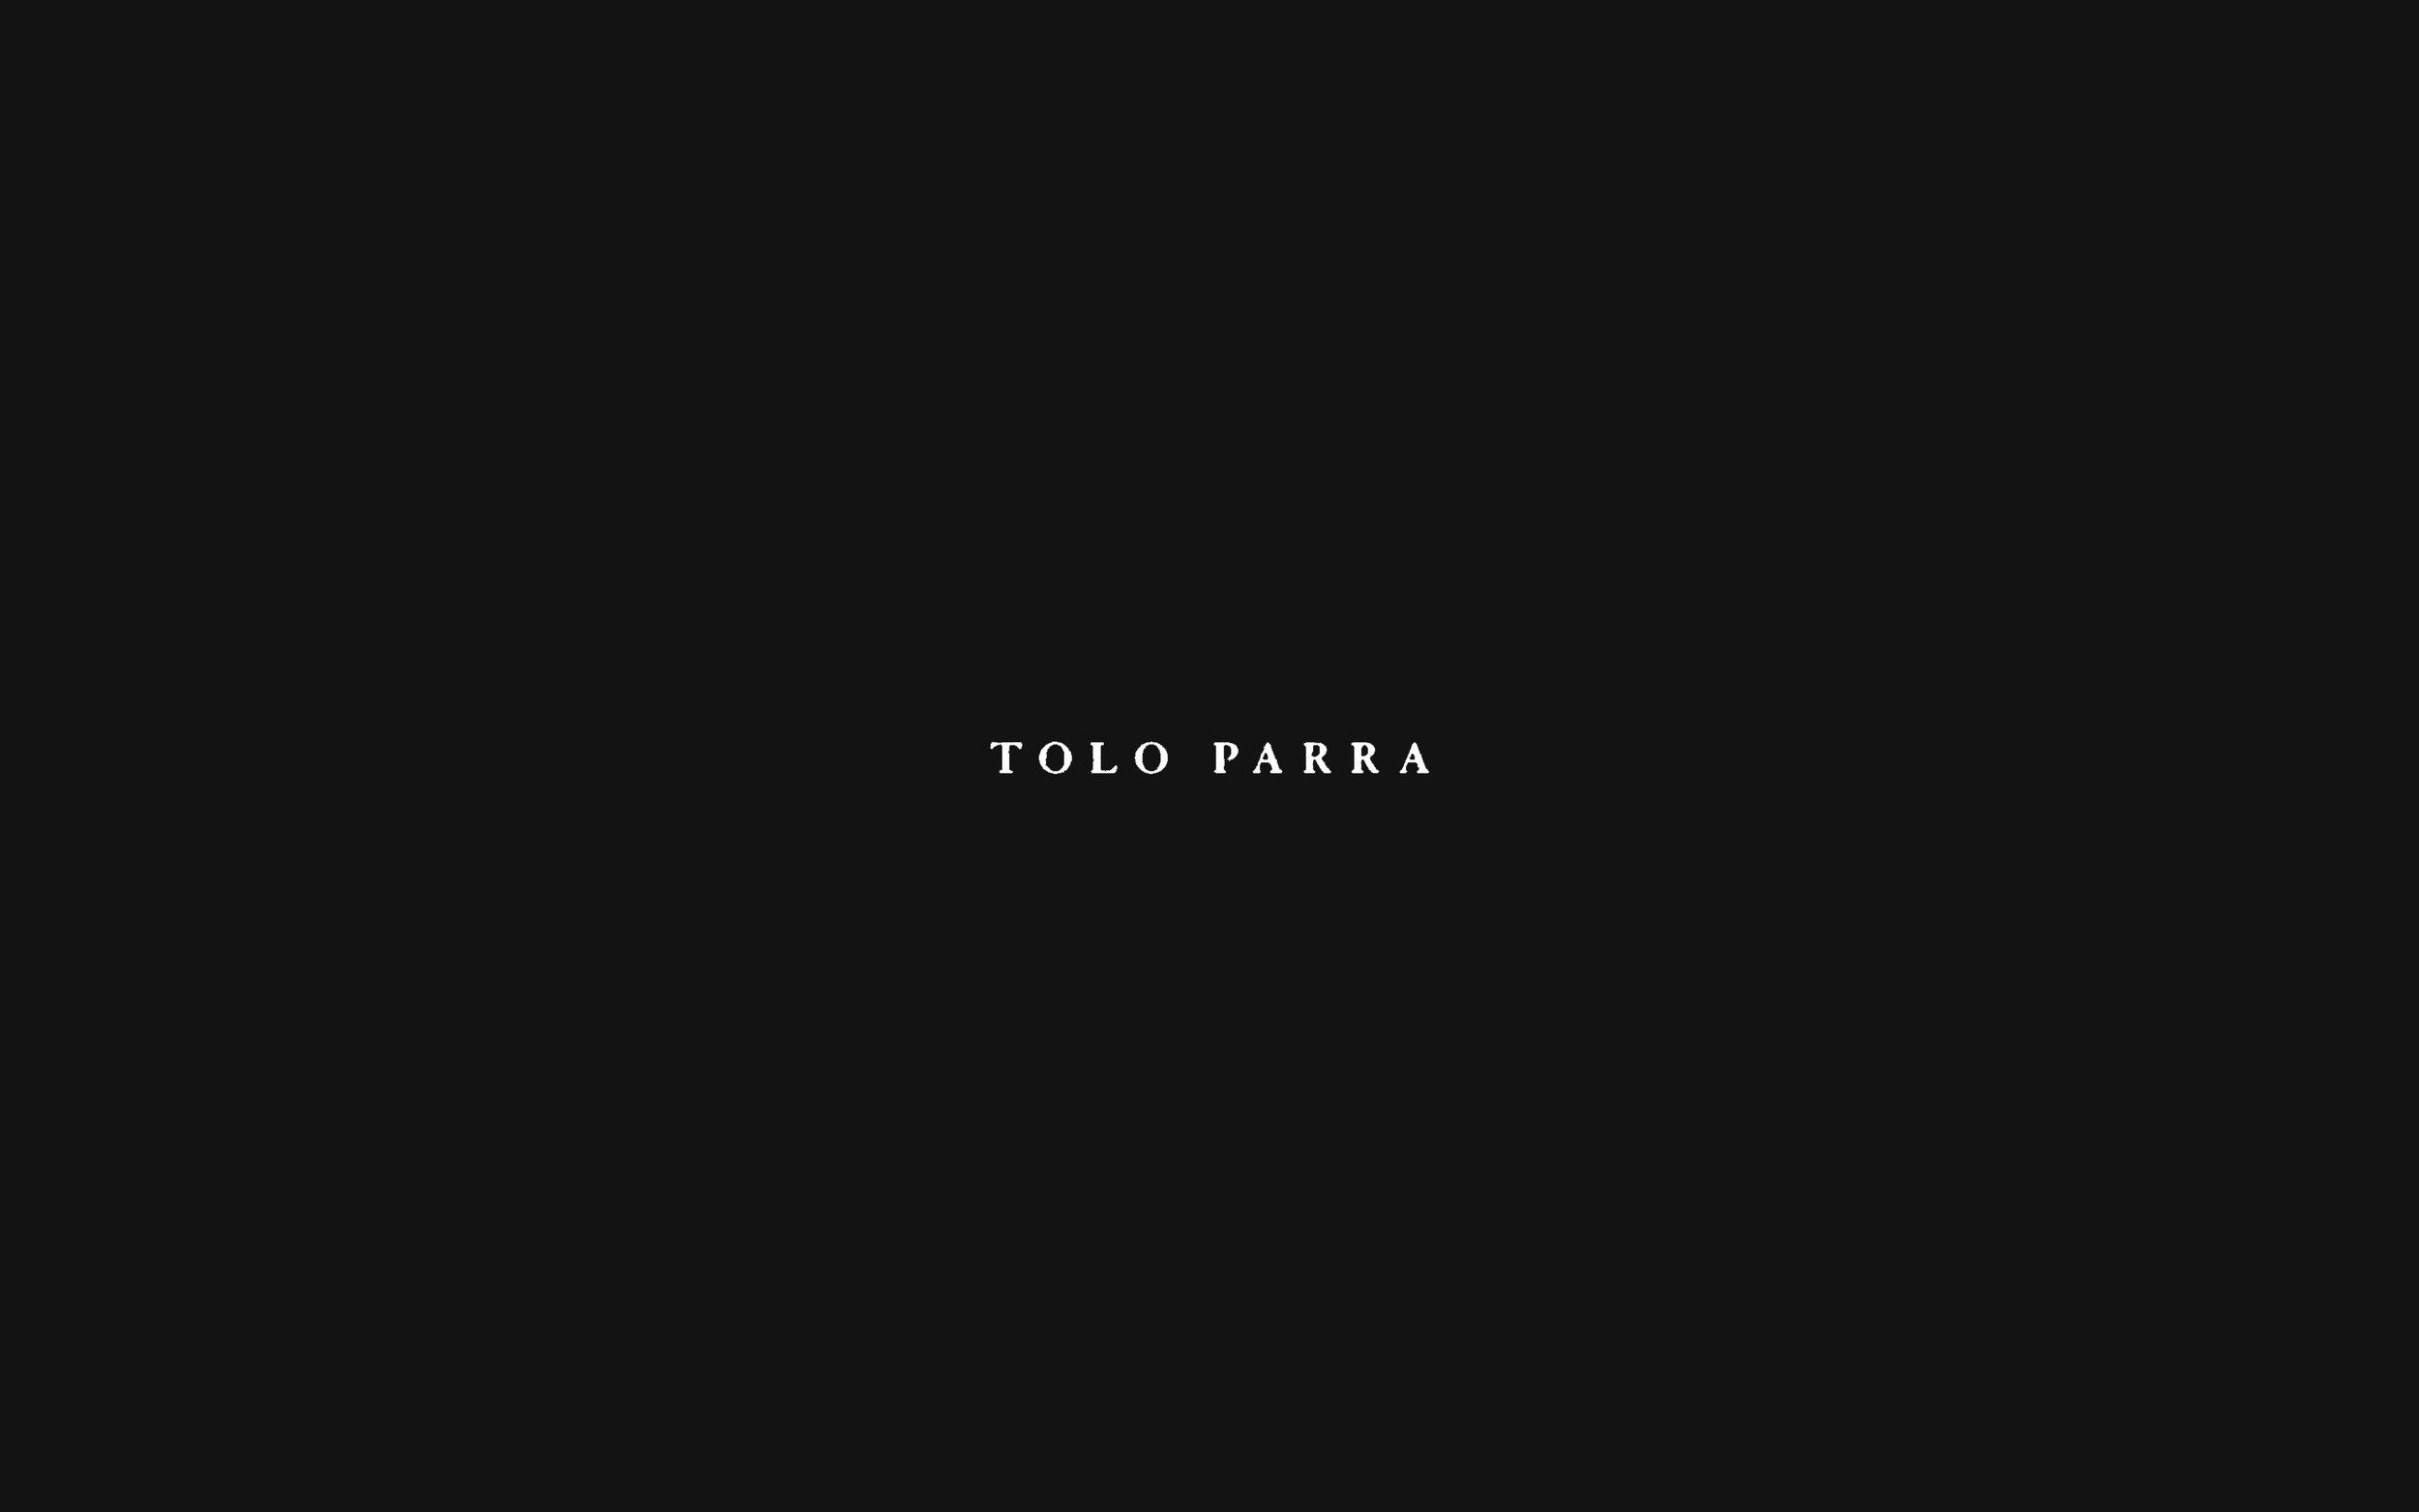 4B__Tolo_Parra_00.jpg